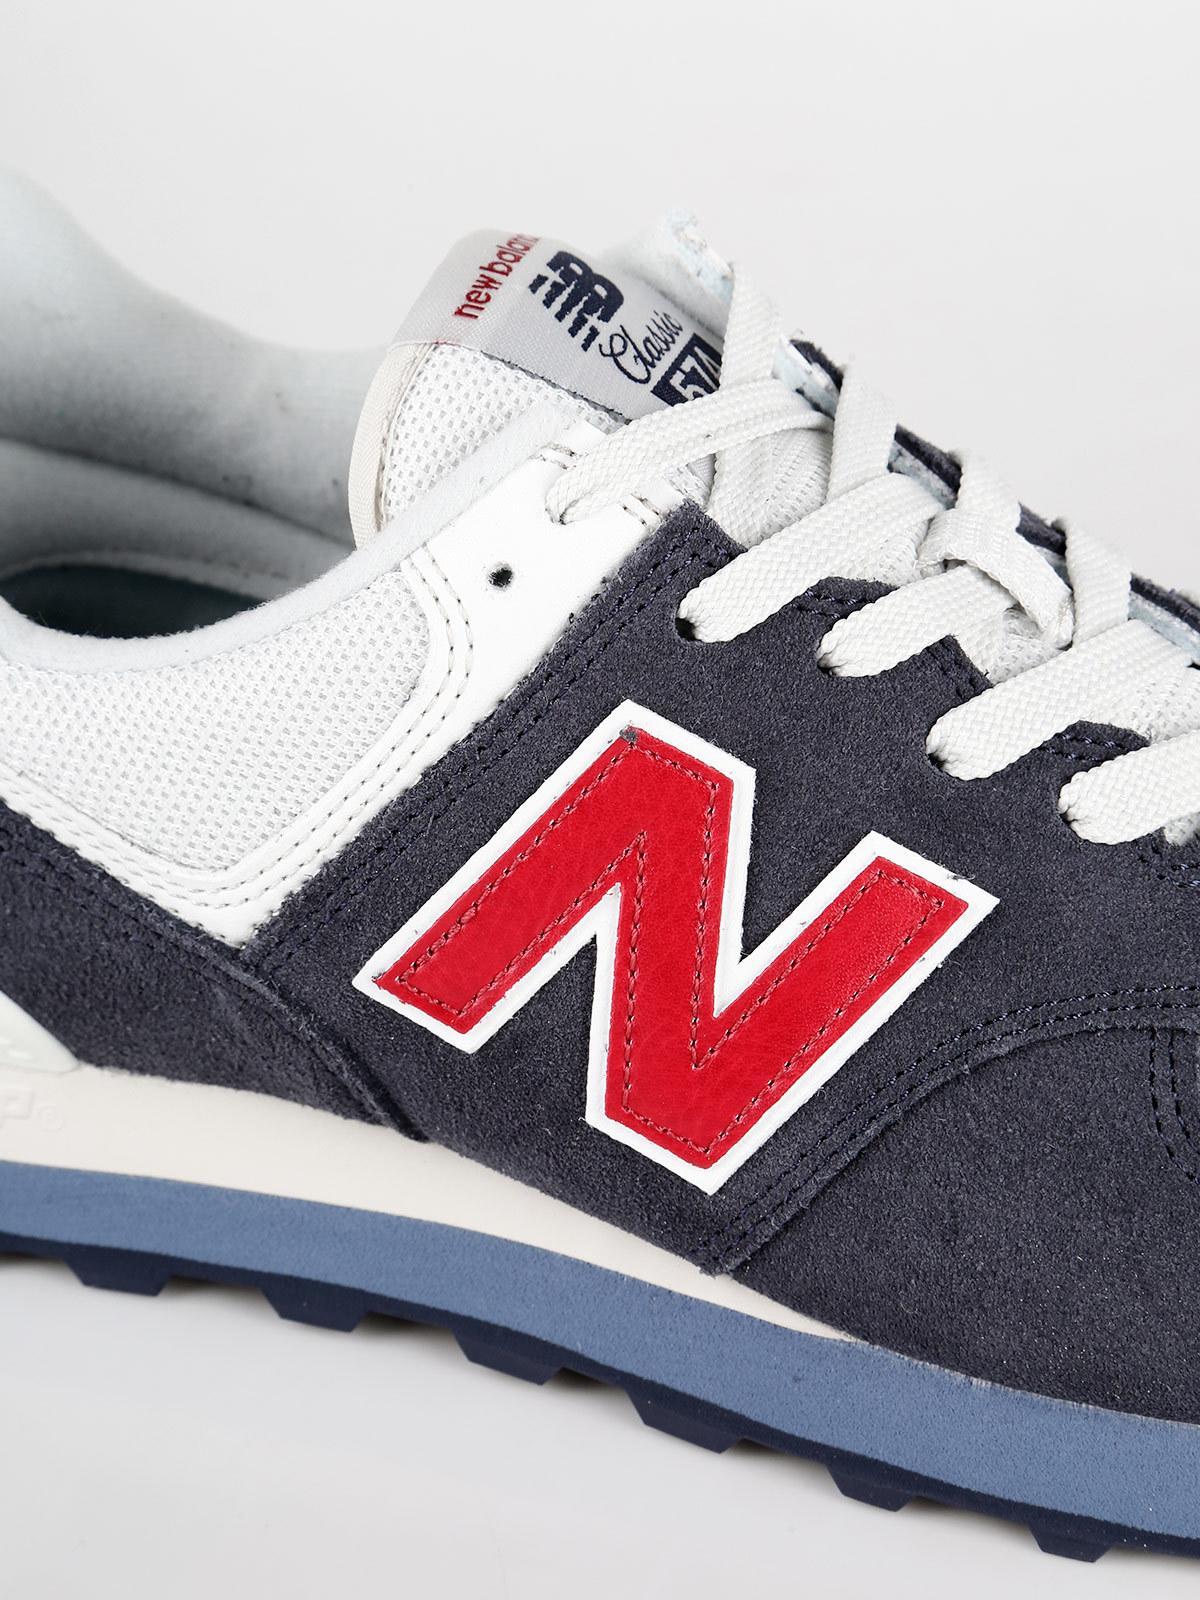 brand new 033c2 a5ed8 Sneakers basse in pelle e tessuto blu - ML574ESC new balance ...